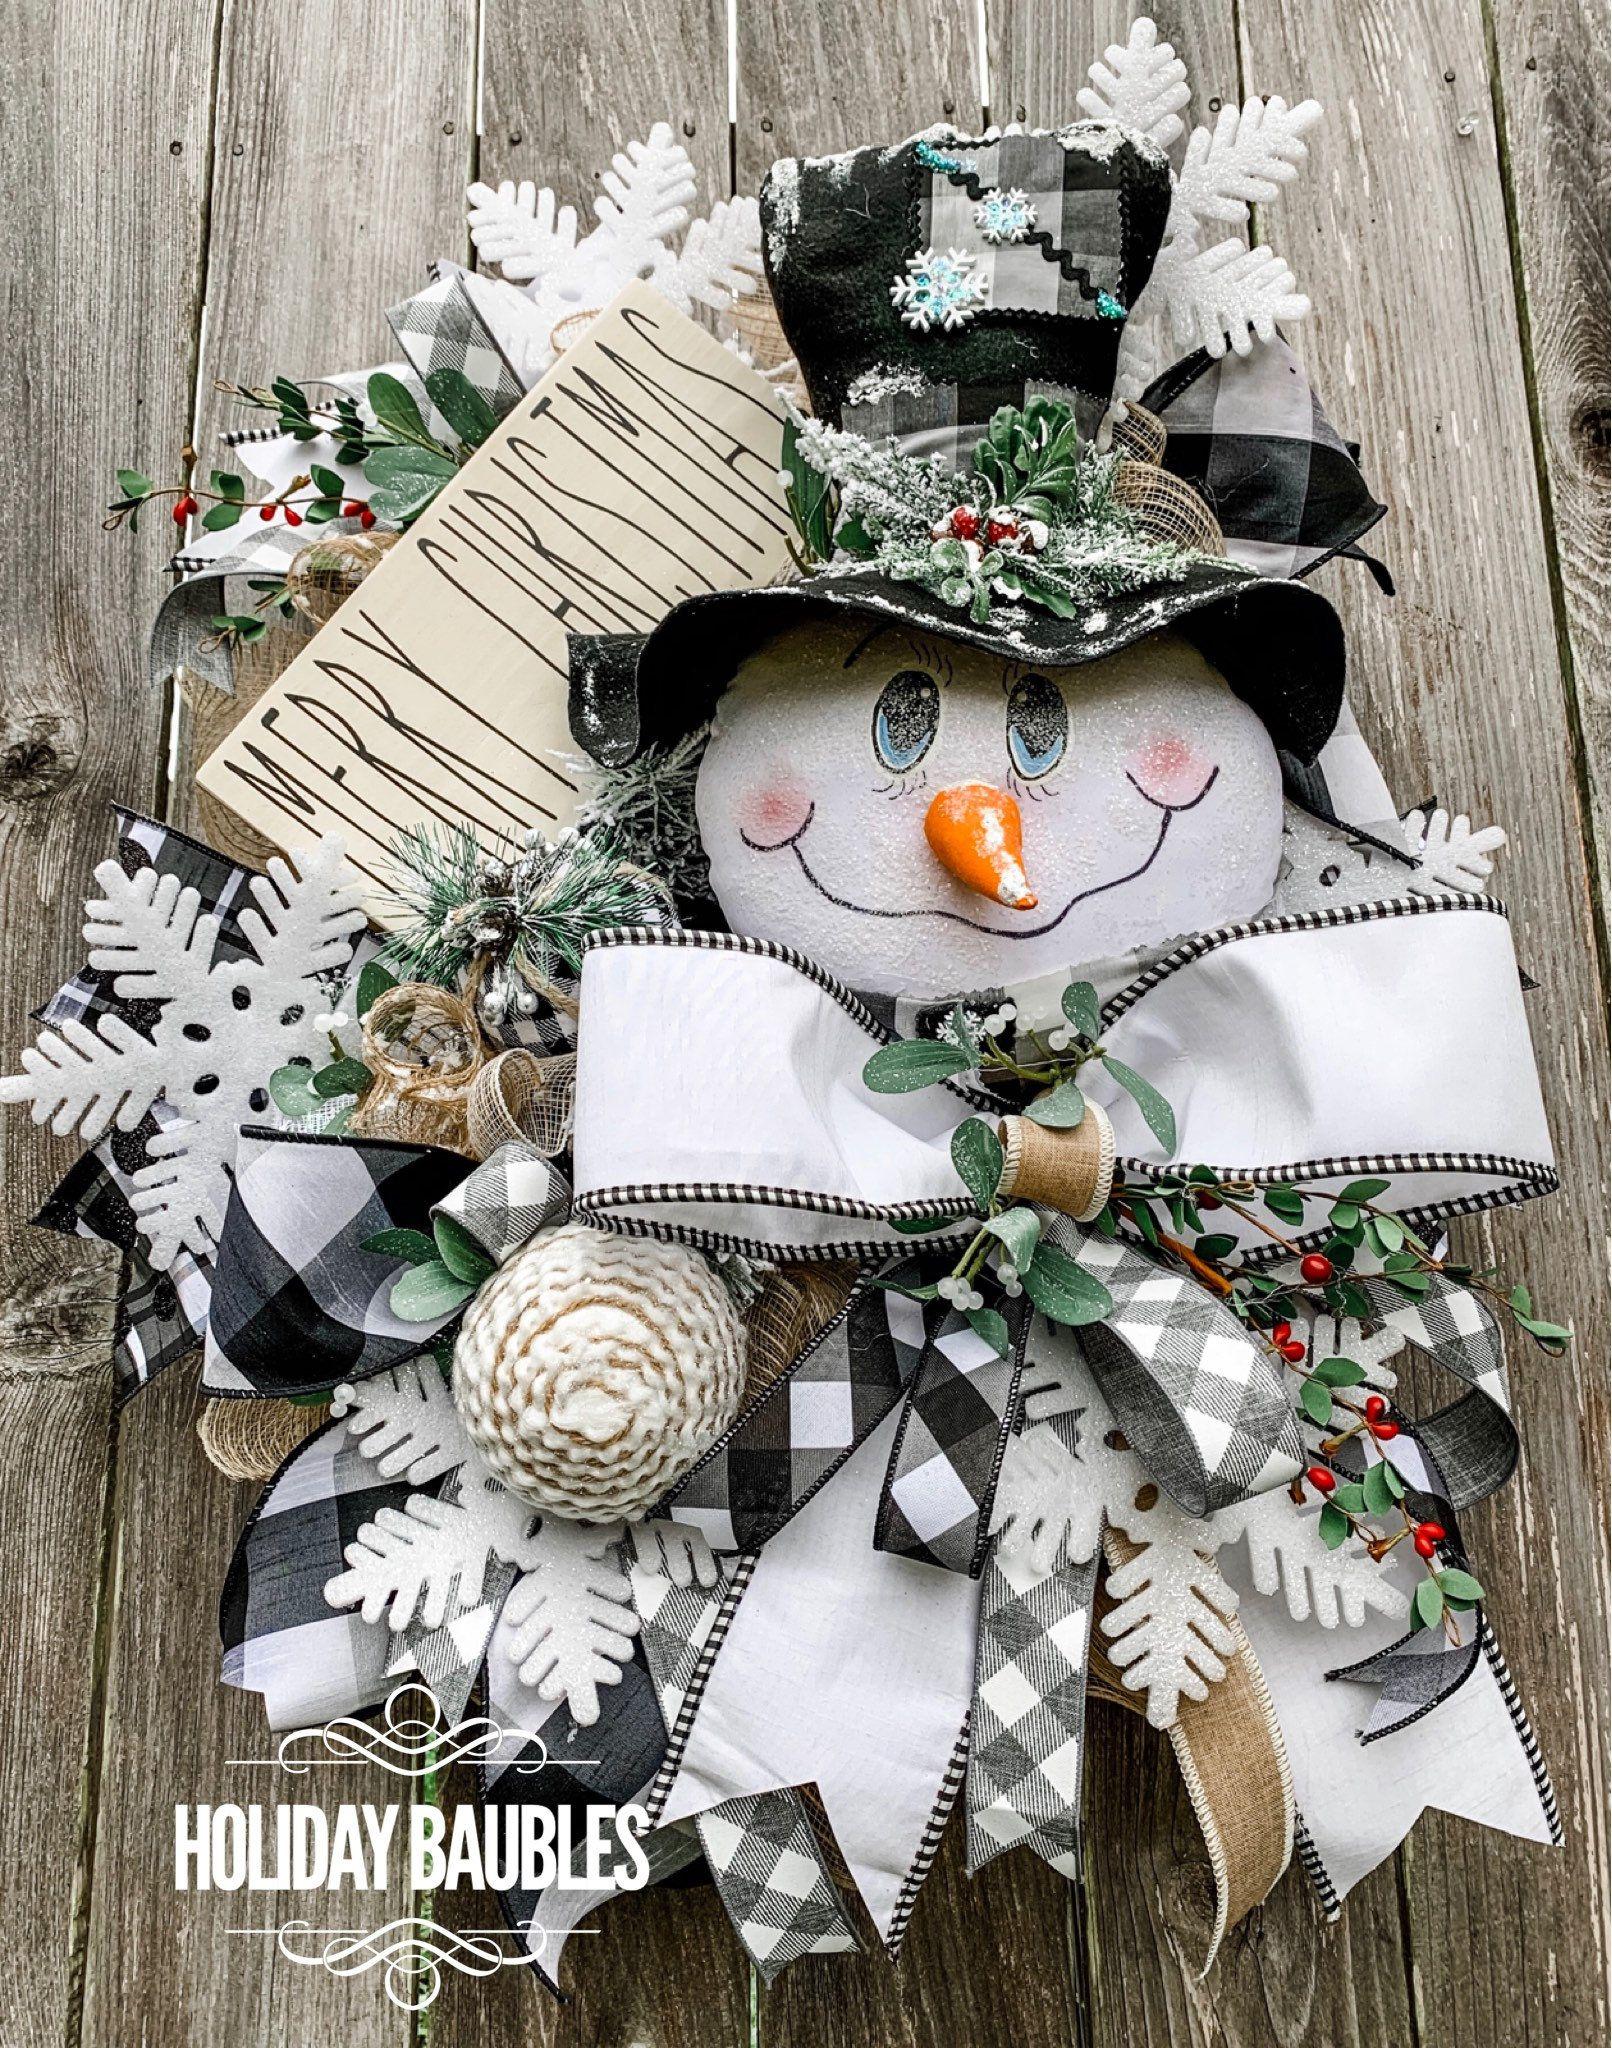 Christmas Wreath Snowman Wreath Winter Wreath Holiday Wreath Chrismas Decor Snowman Wreath Snowman Buffalo Plaid Wreath Free Shipping Chrismas Decorations Christmas Wreaths Holiday Decor